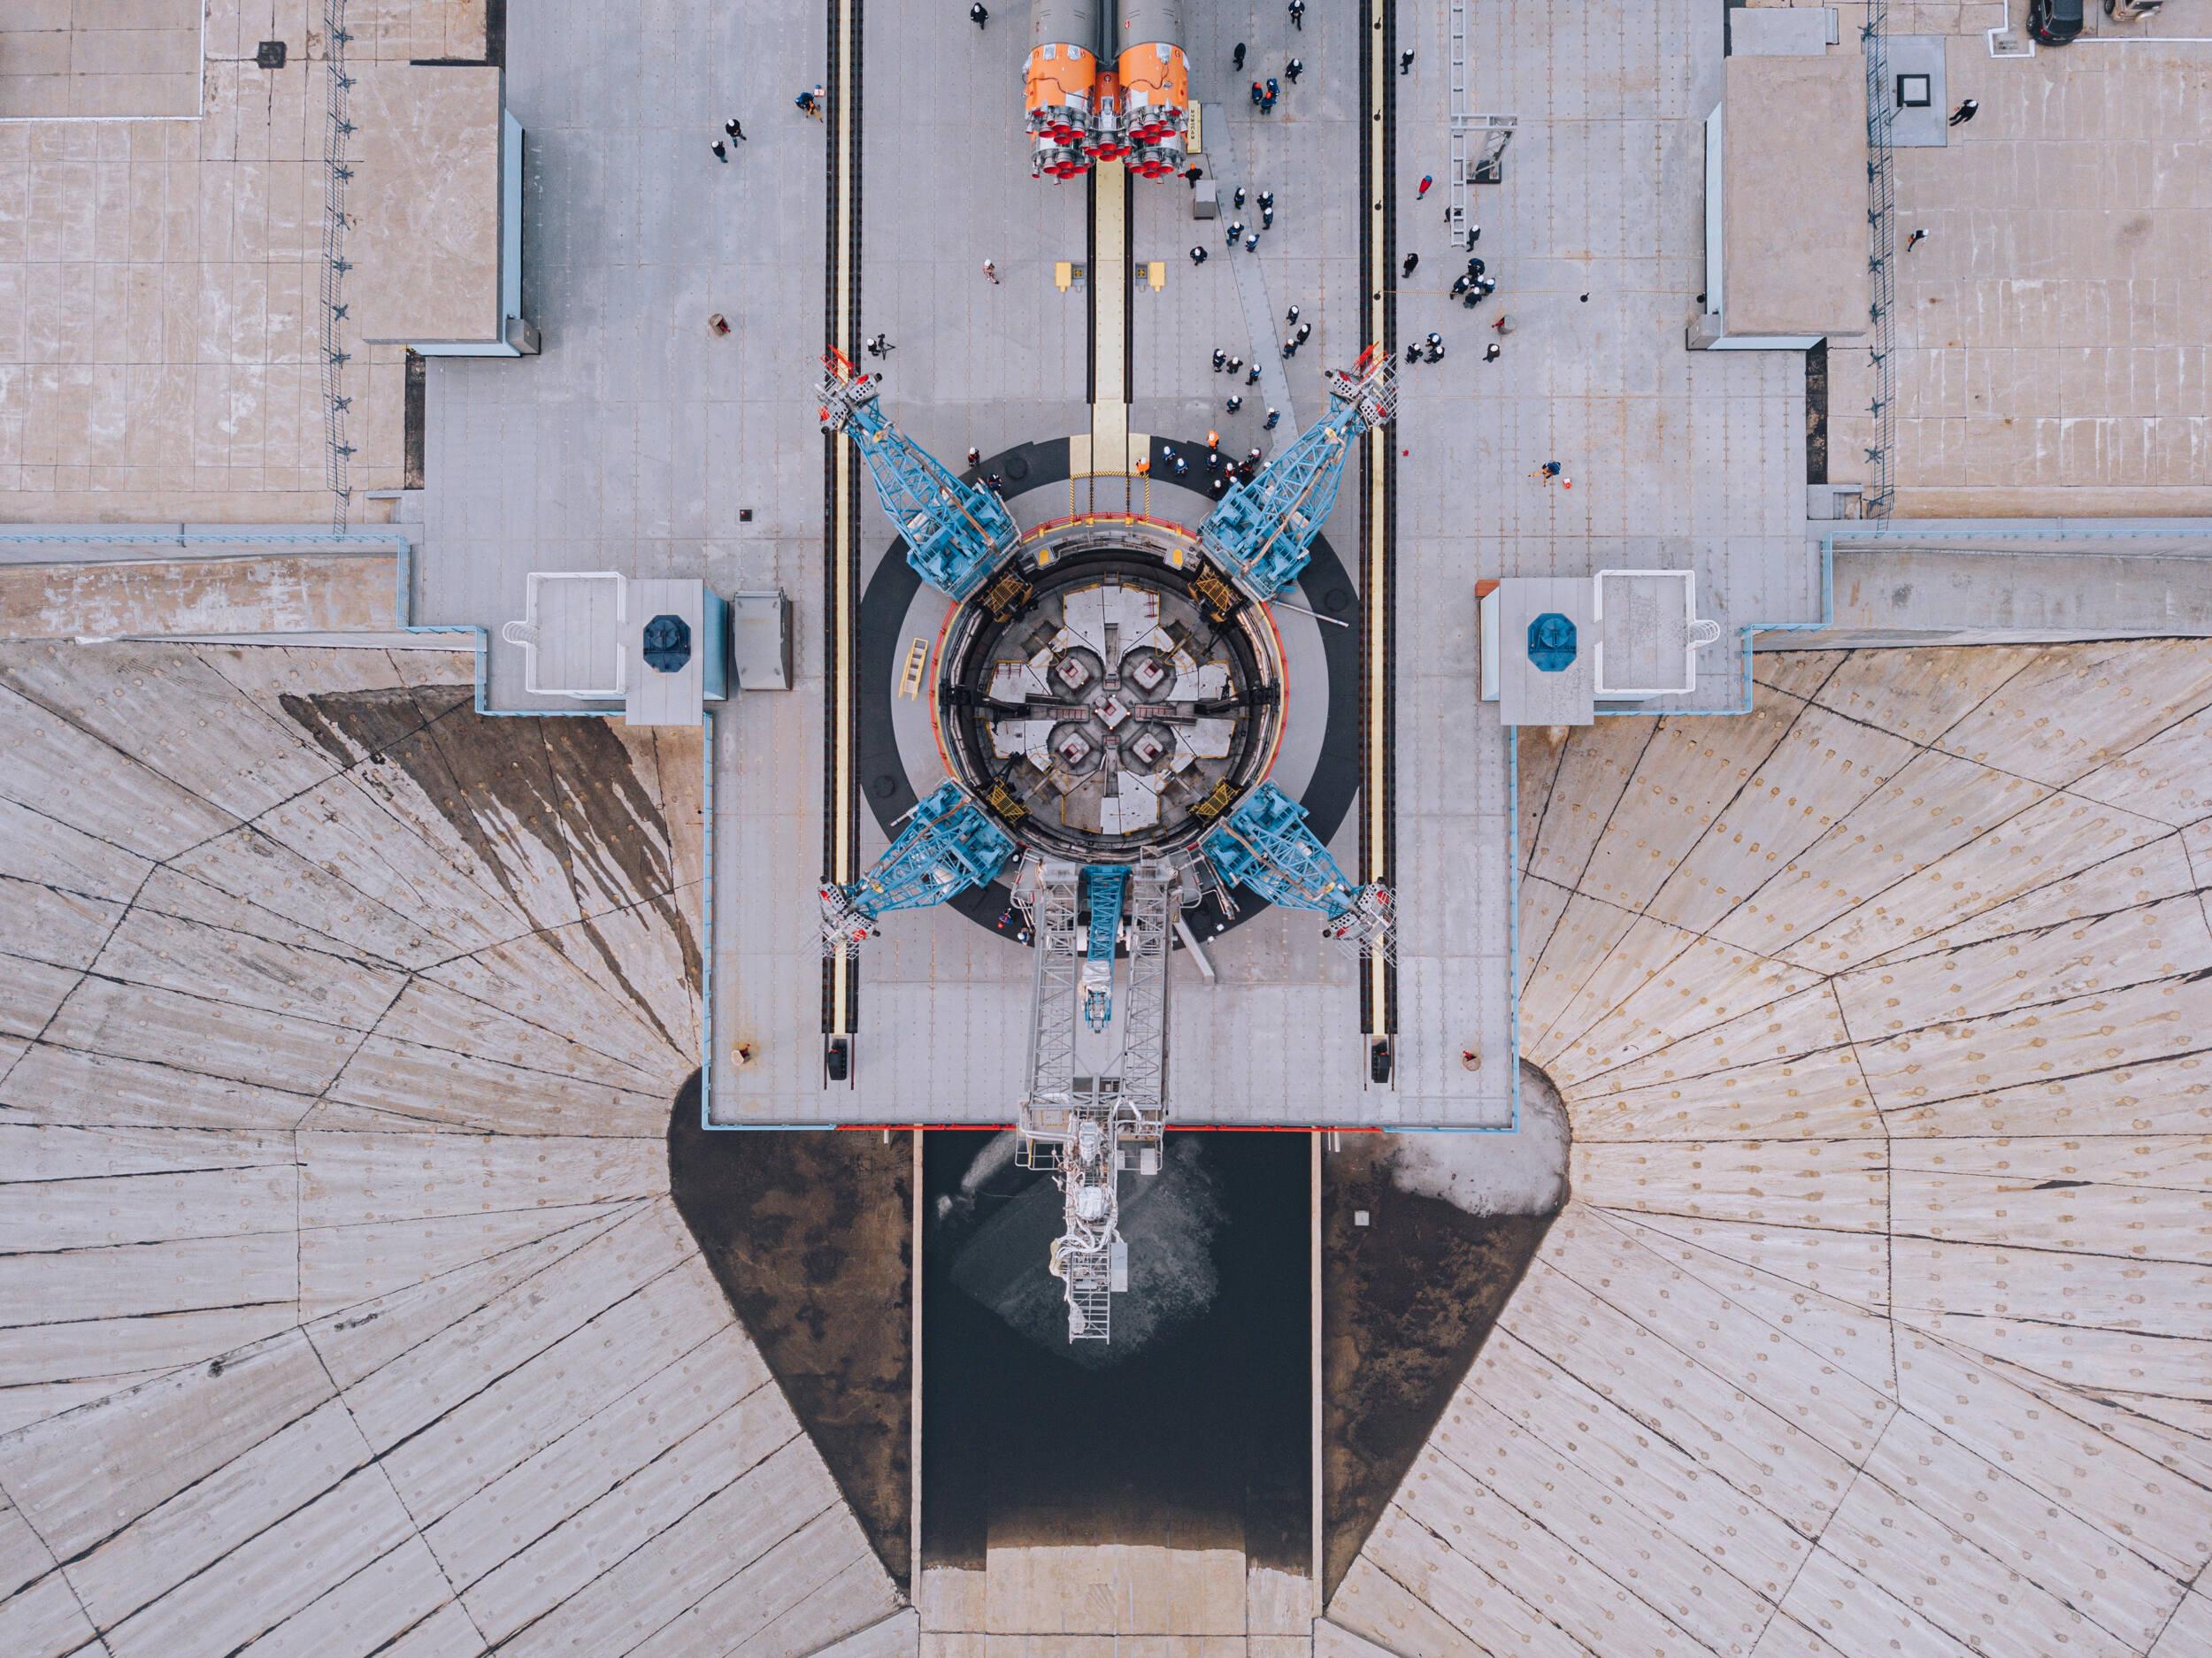 Soyouz-2.1b (36 OneWeb) - Vos - 25.4.2021 2474